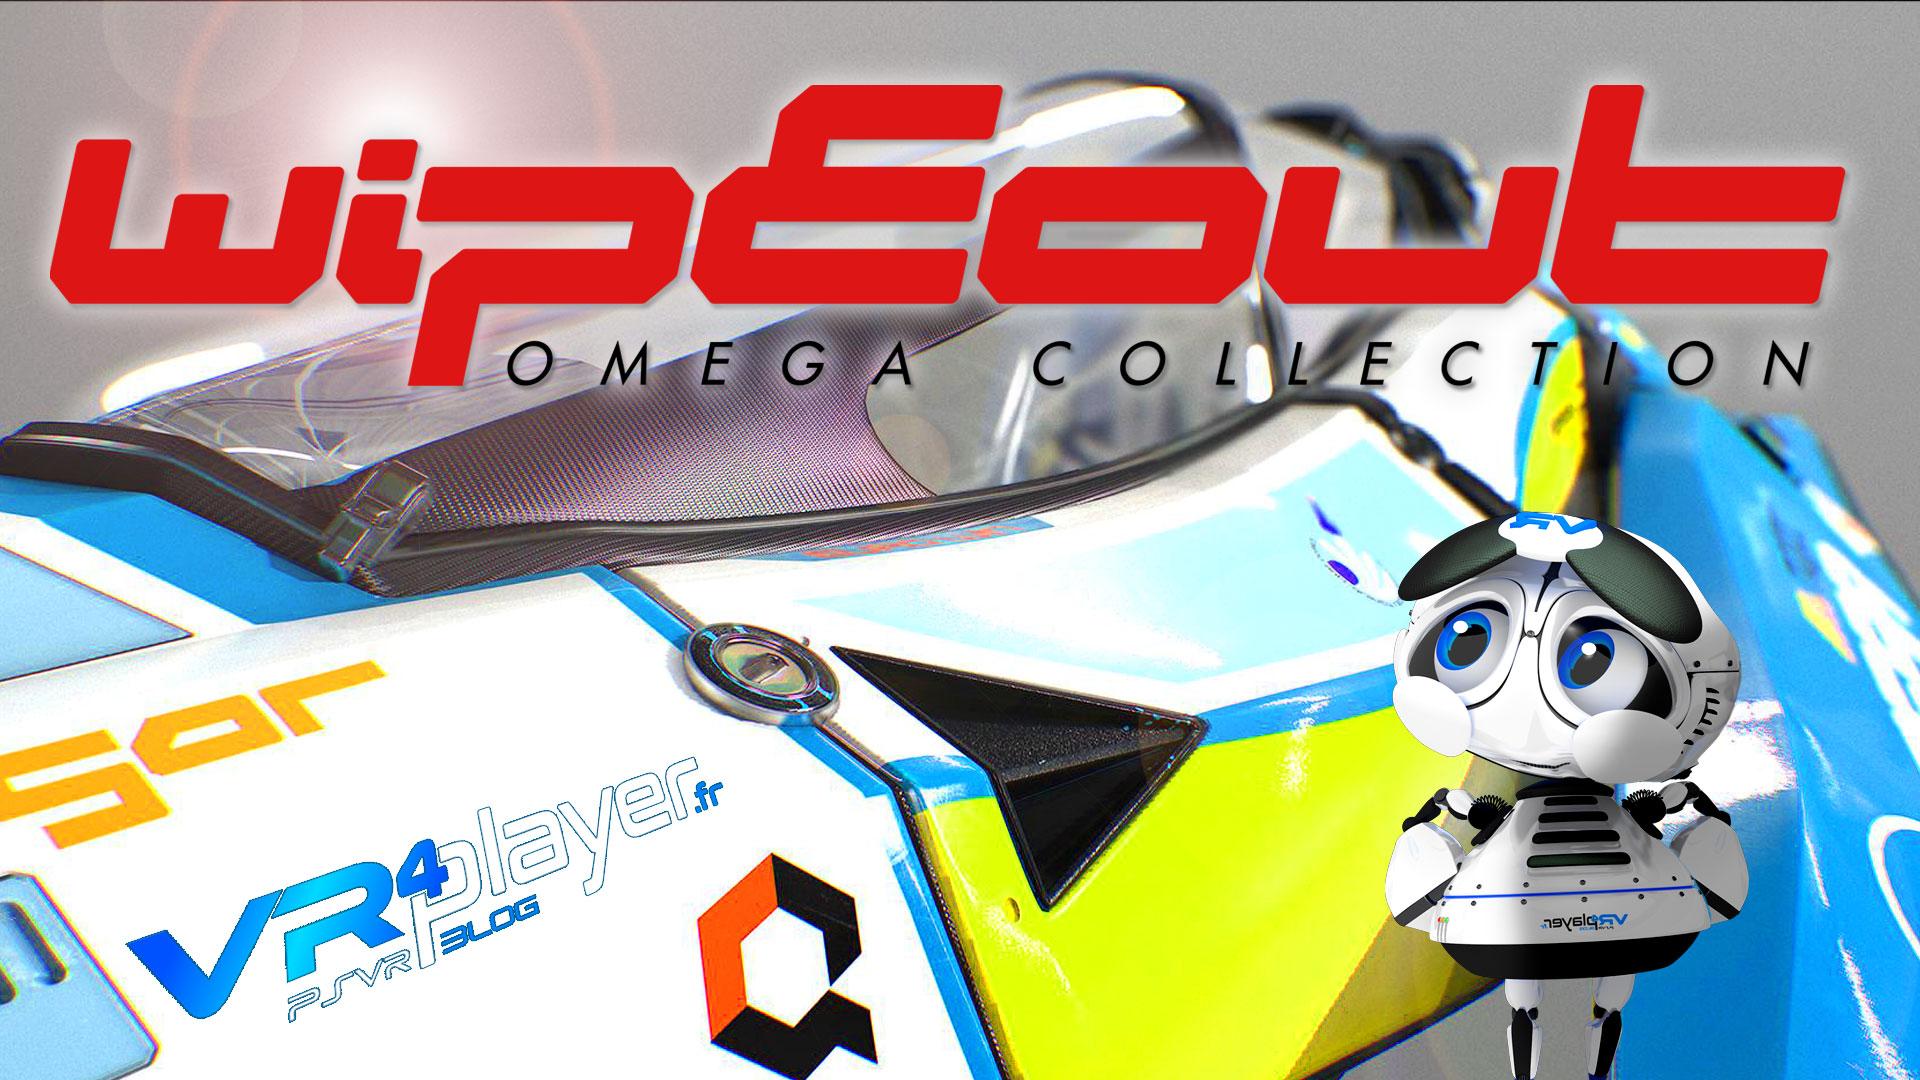 WipEout Omega Collection, le messie du PSVR - vrplayer.fr